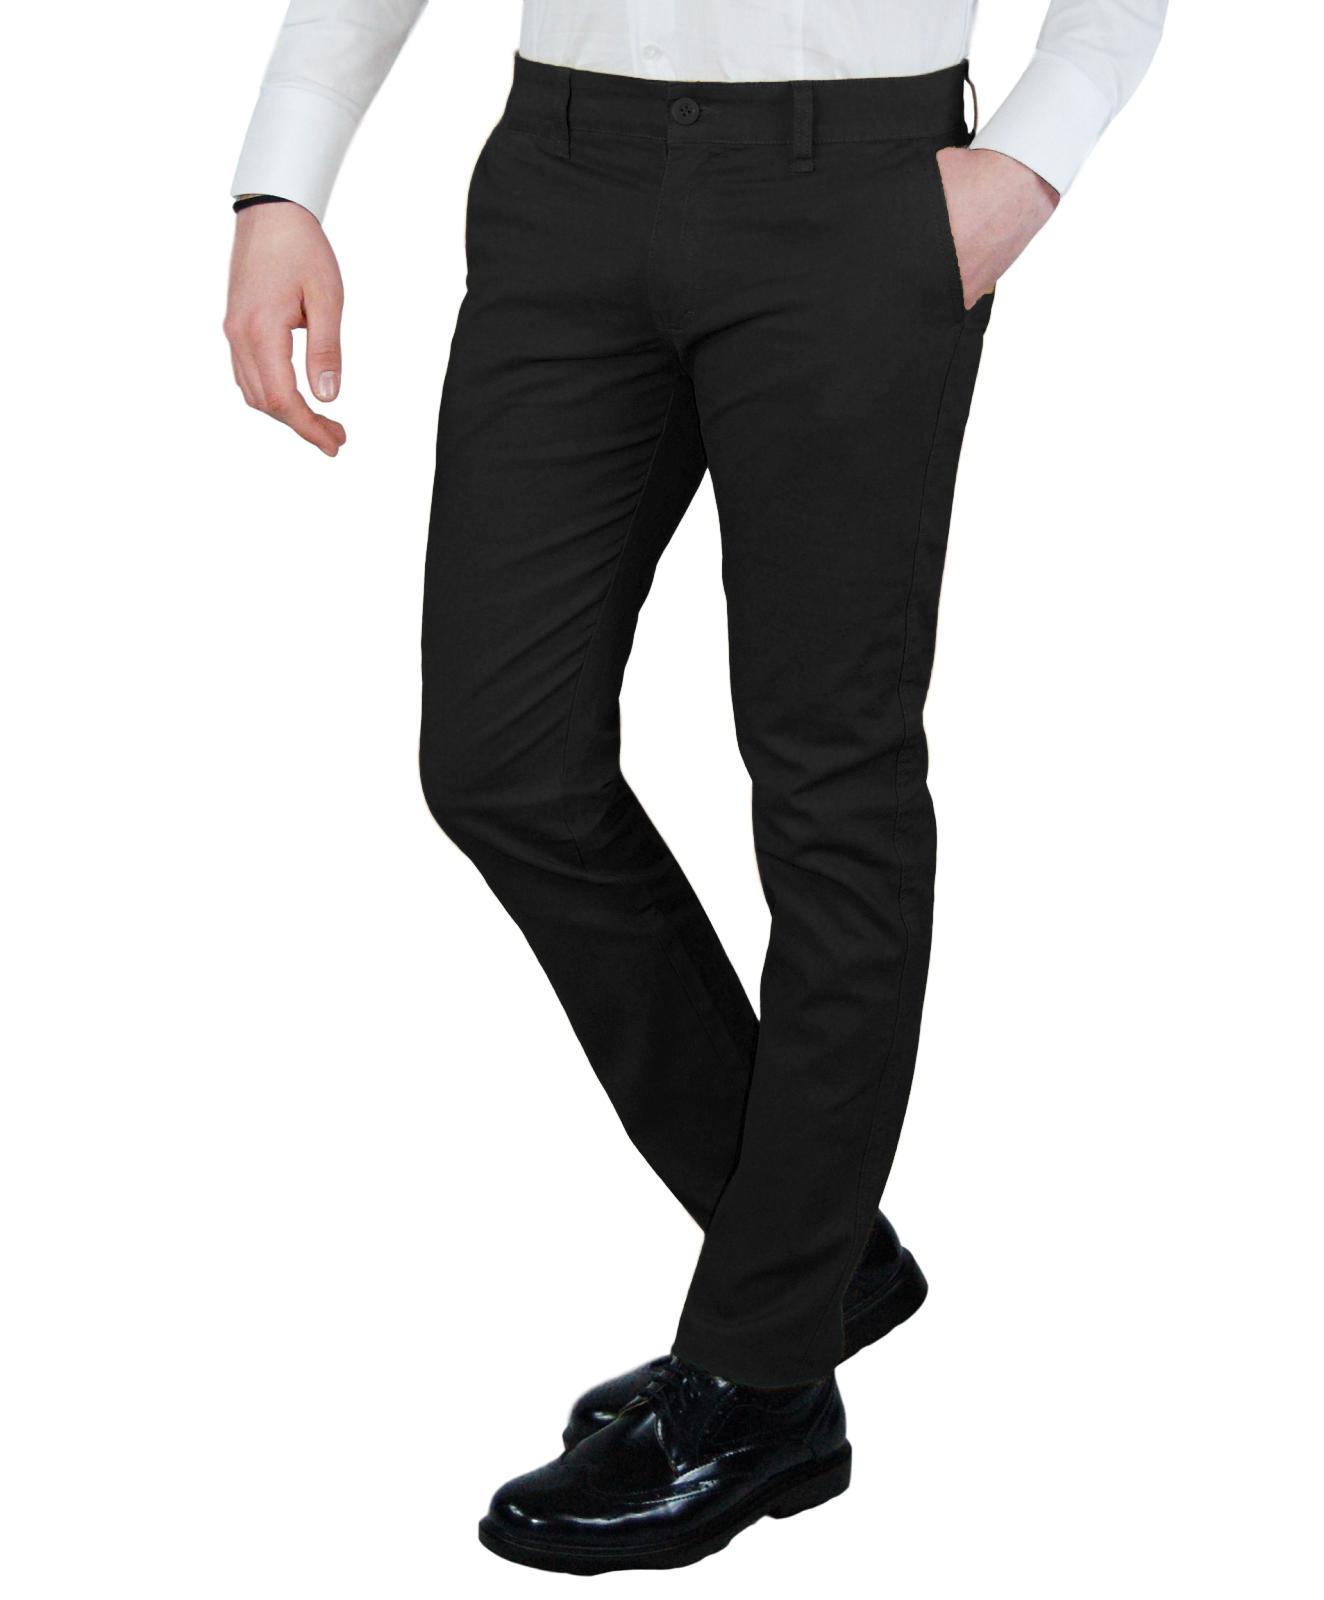 Pantalone-Uomo-Chino-Primaverile-slim-fit-Pantaloni-Eleganti-Blu-Verde-Nero miniatura 25